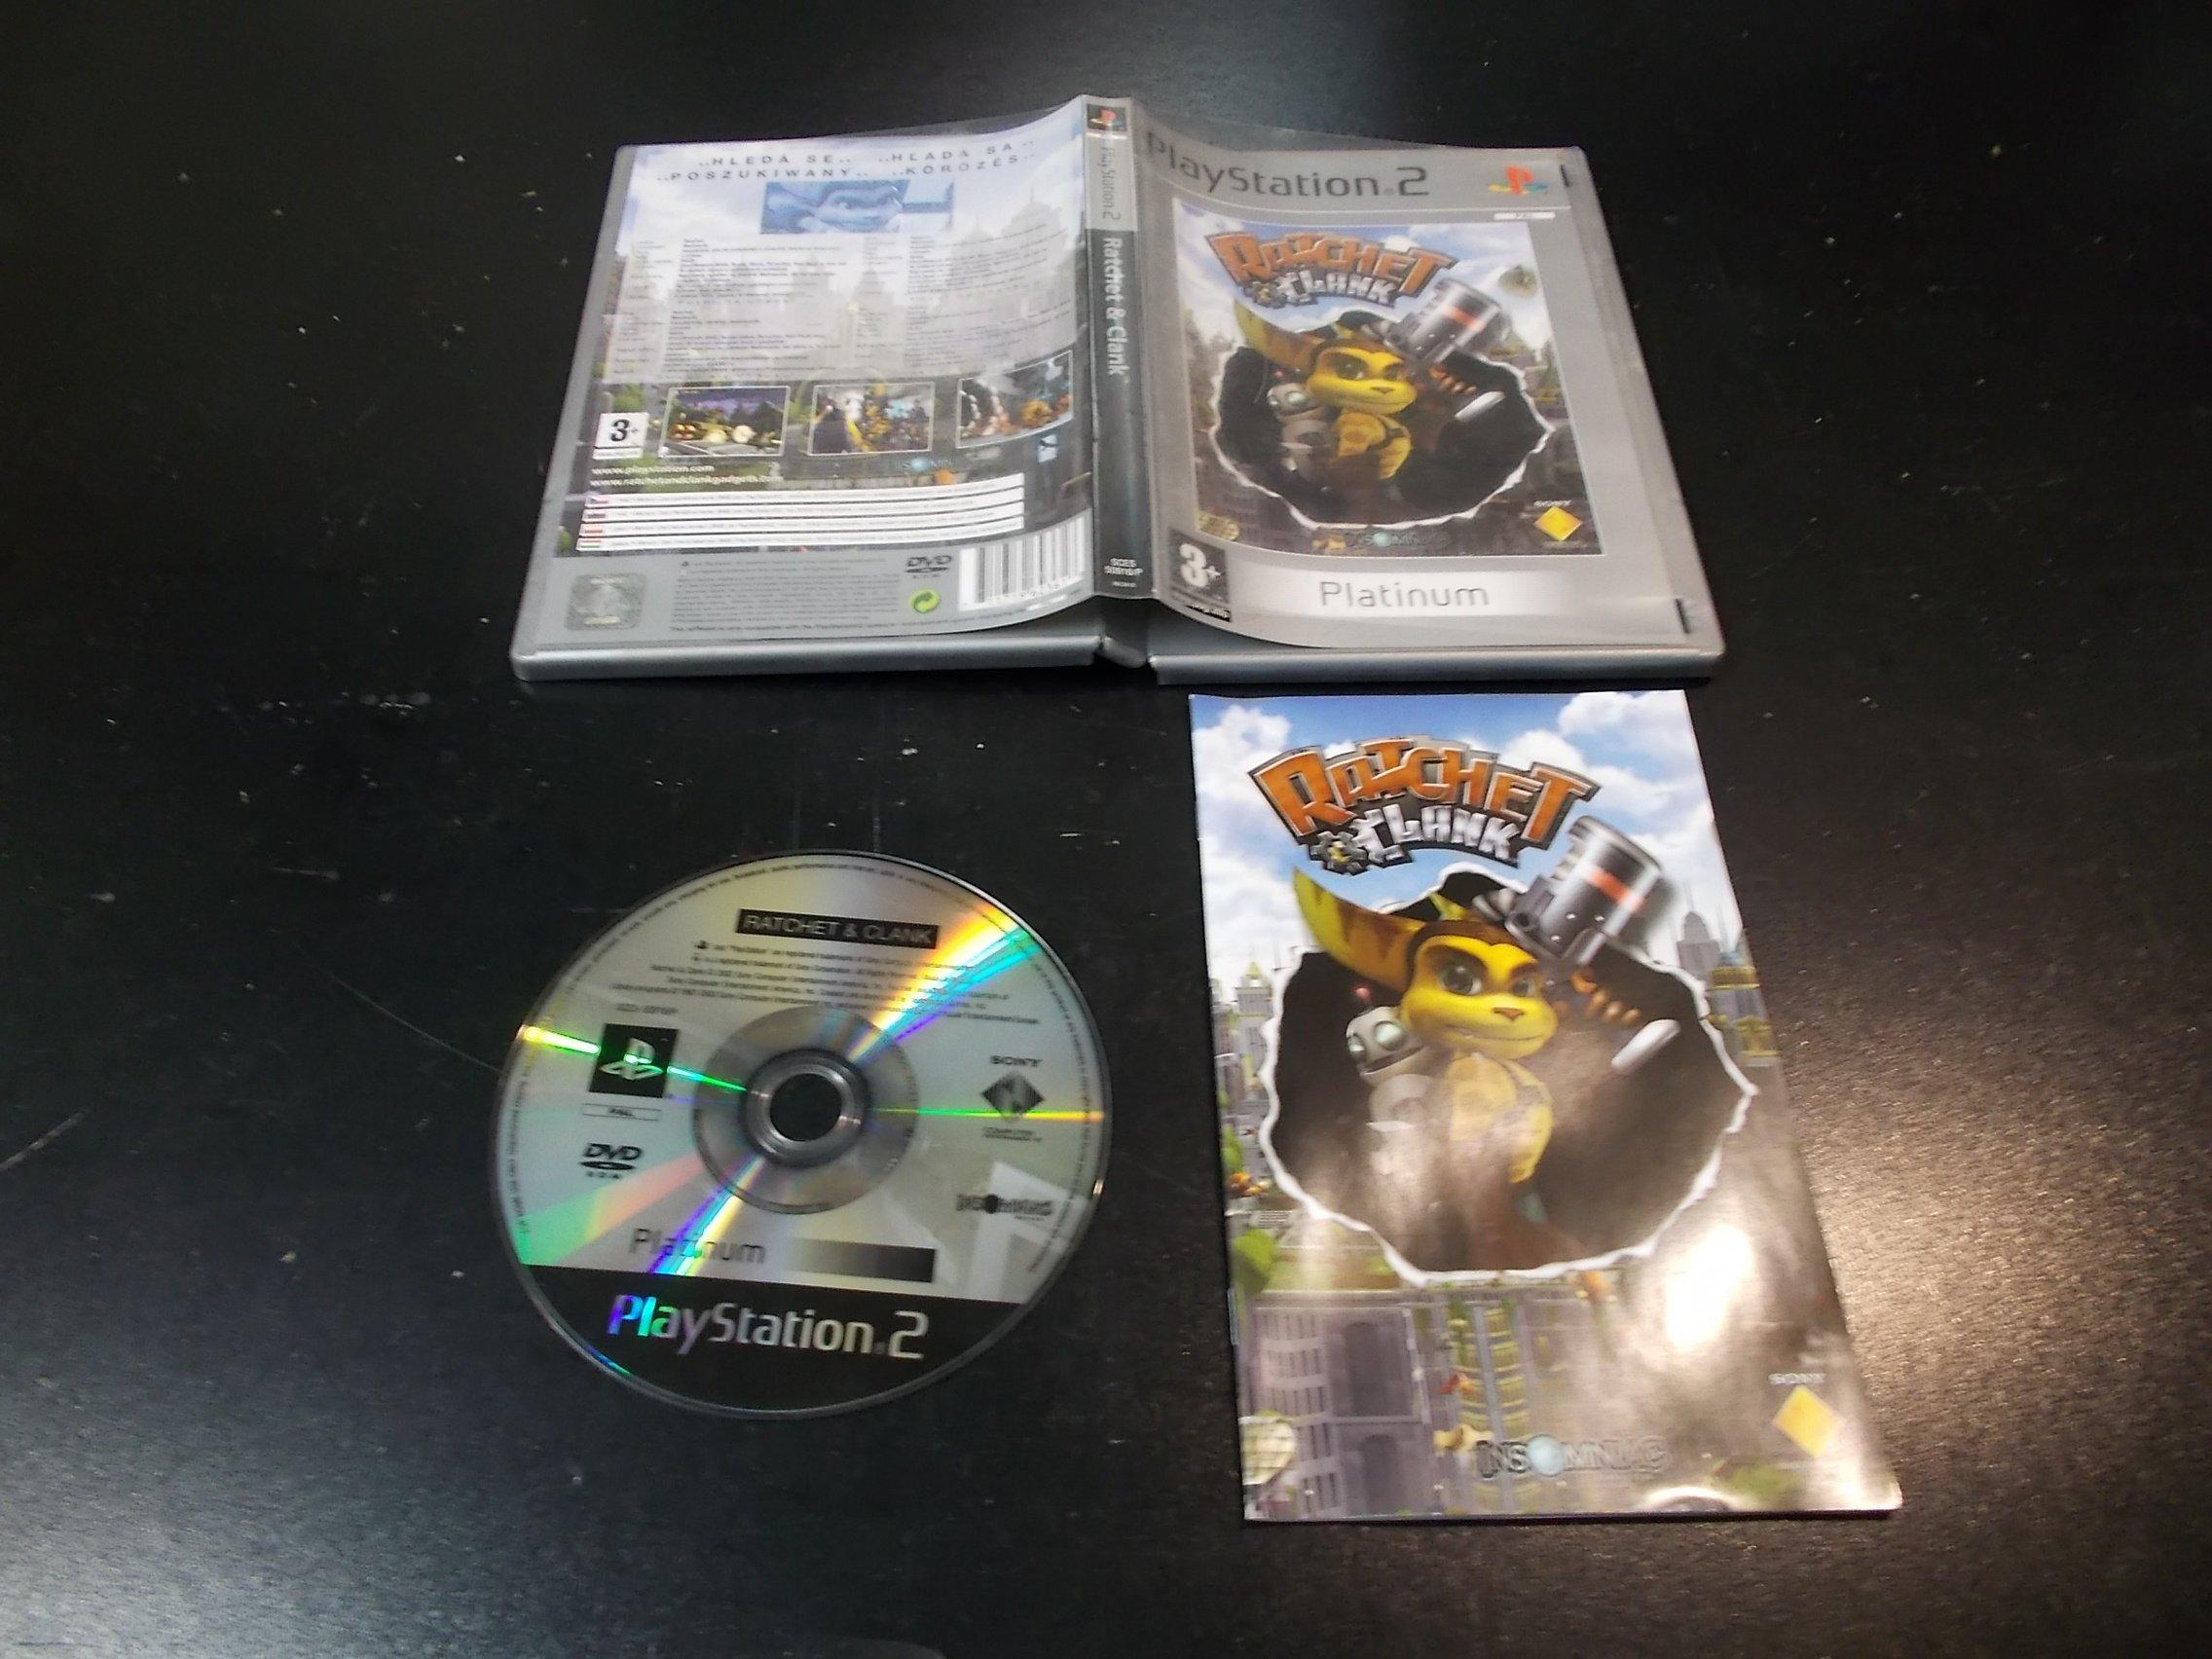 Ratchet & Clank - GRA Ps2 - Sklep